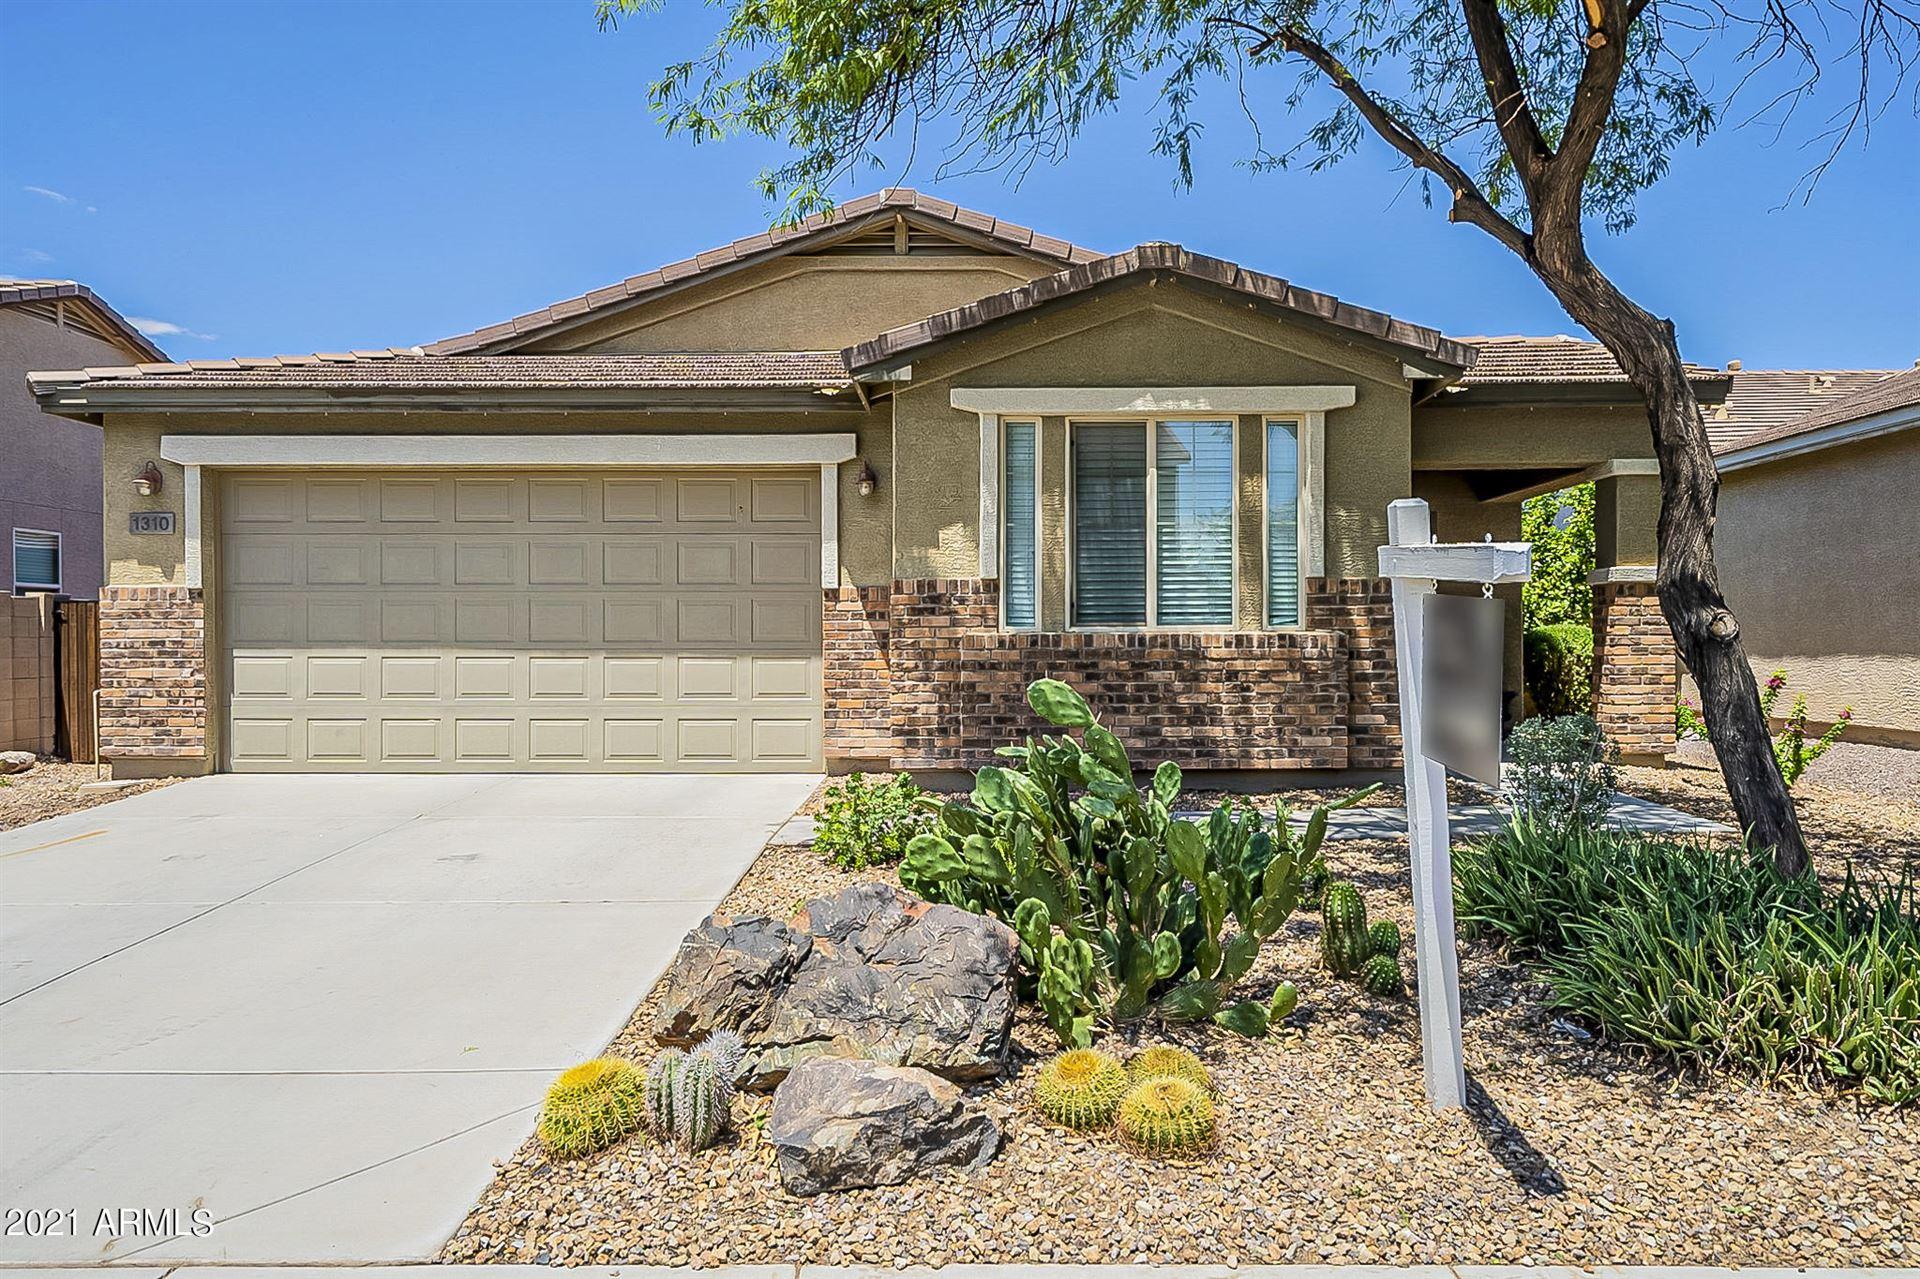 1310 E SUGEY Court, San Tan Valley, AZ 85143 - MLS#: 6258757